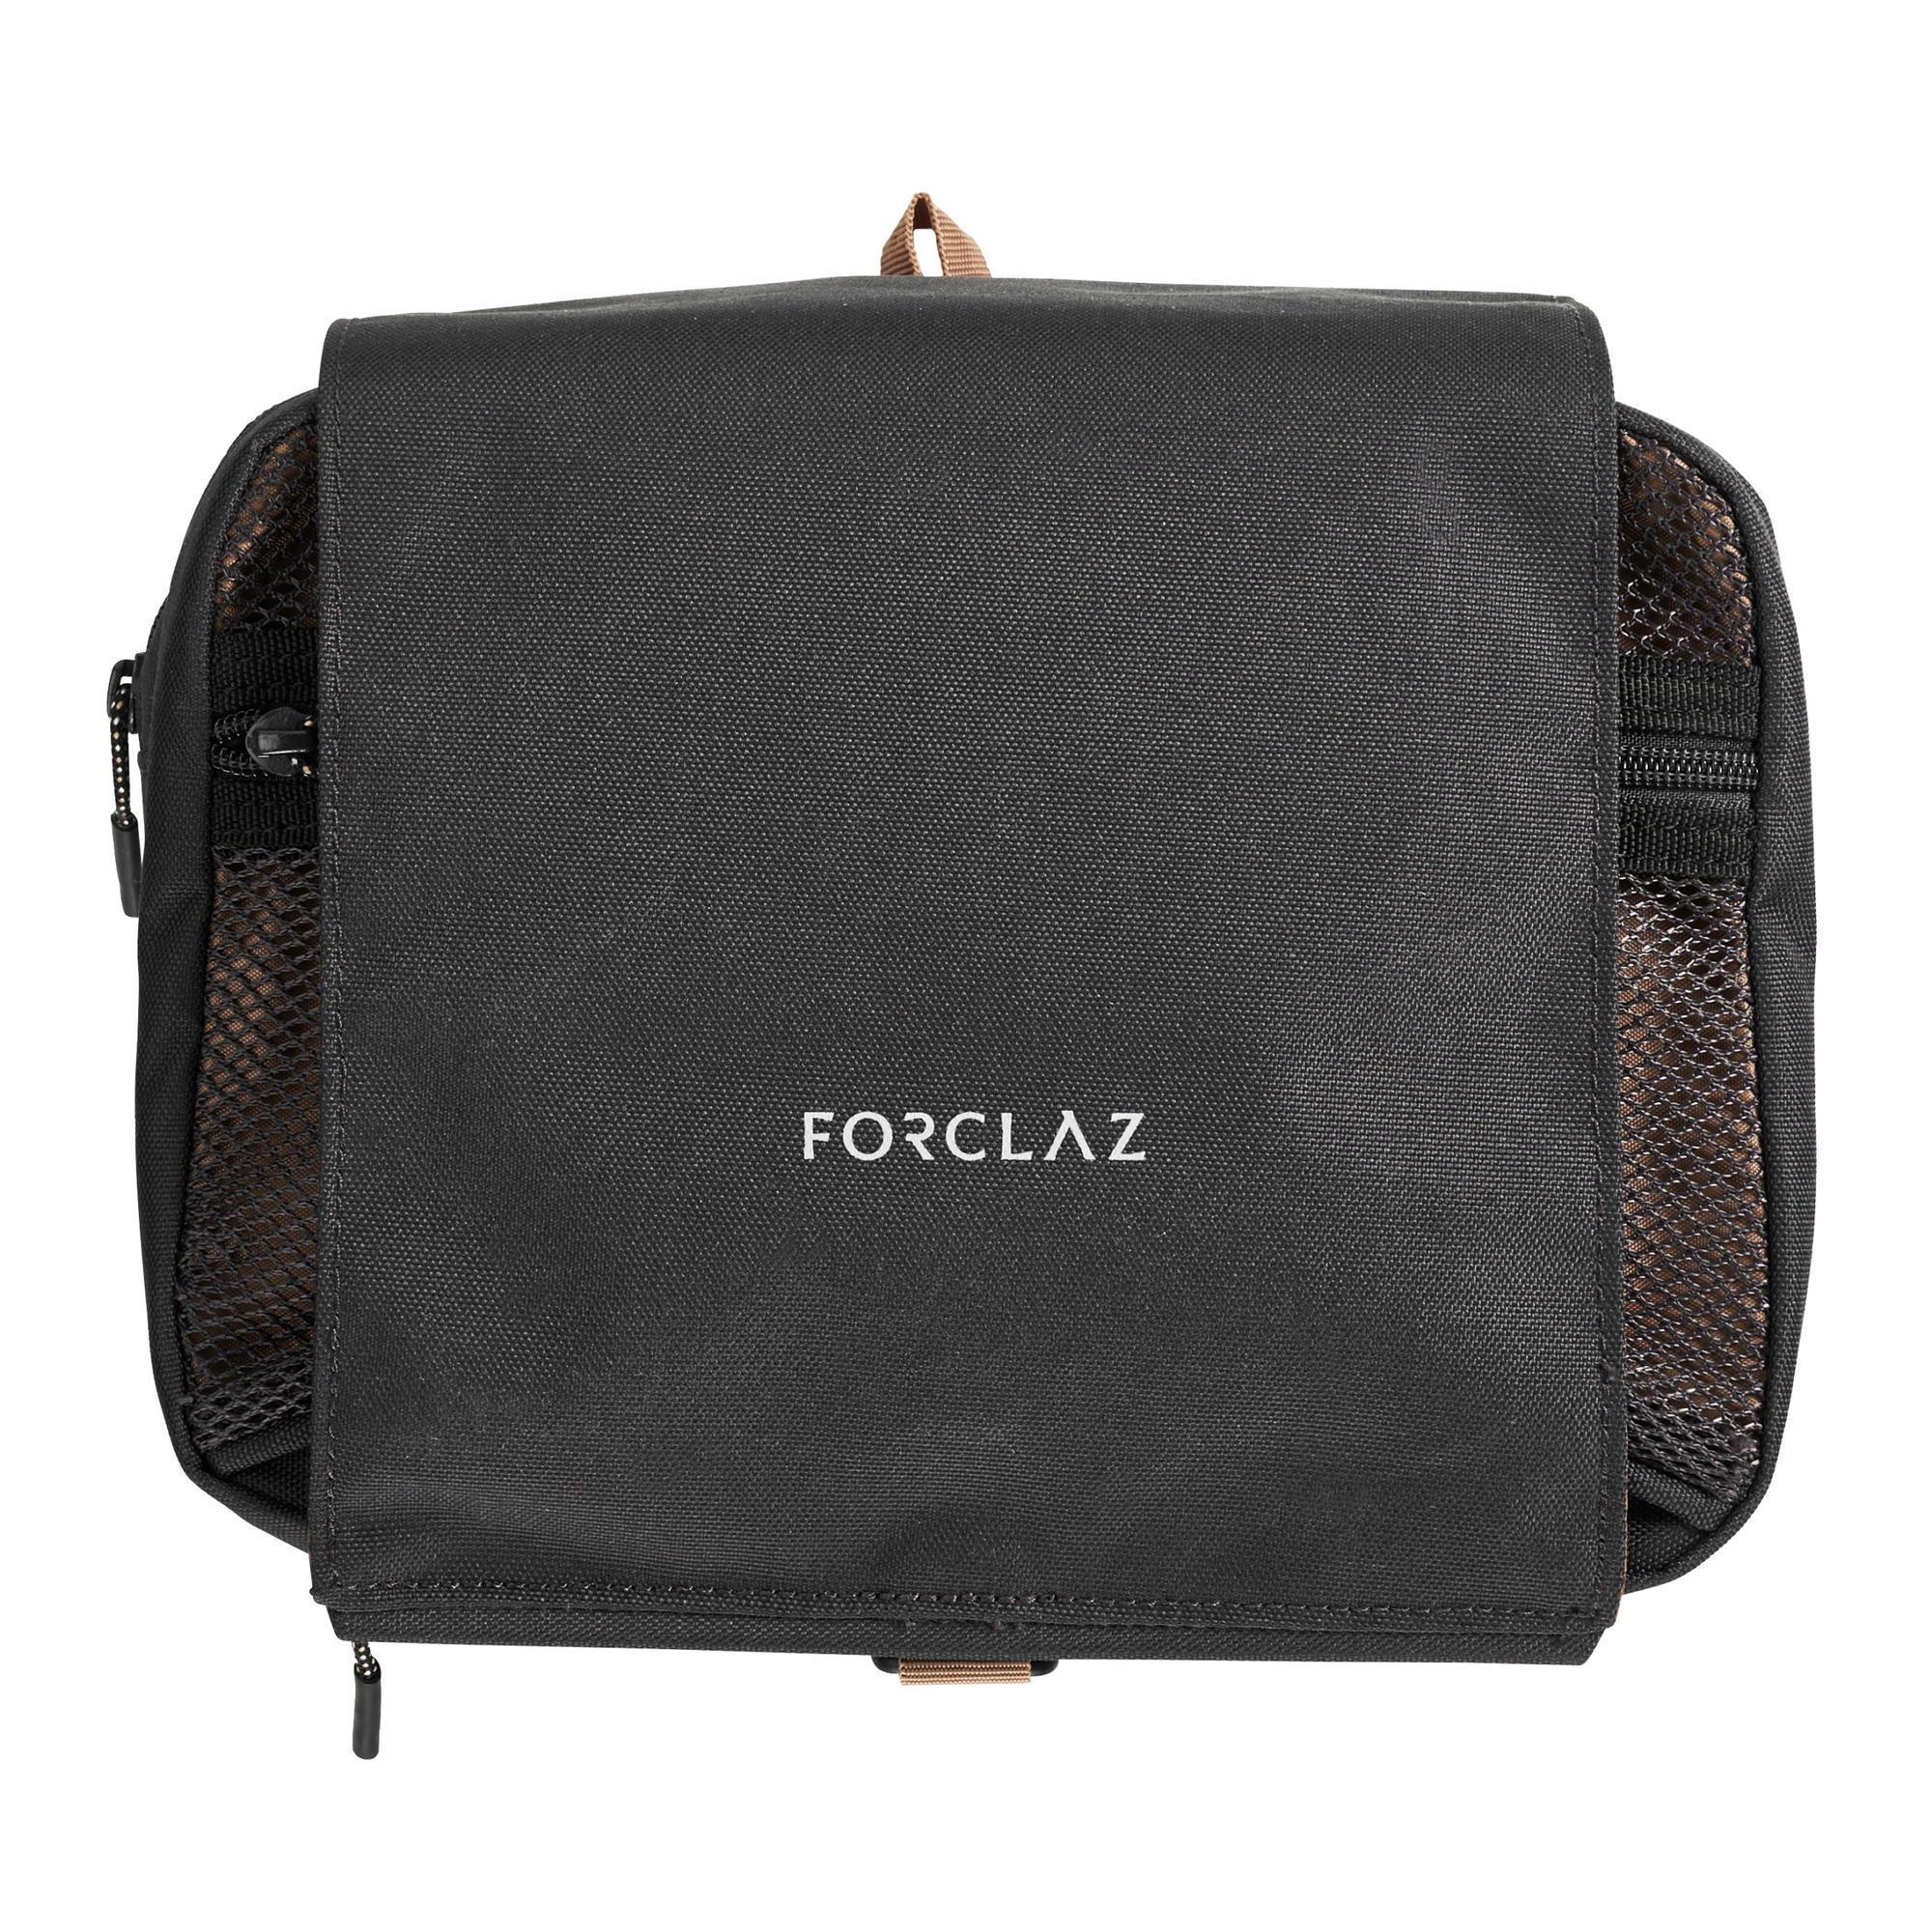 5a75afce96d Rugzak accessoires kopen | Decathlon.nl